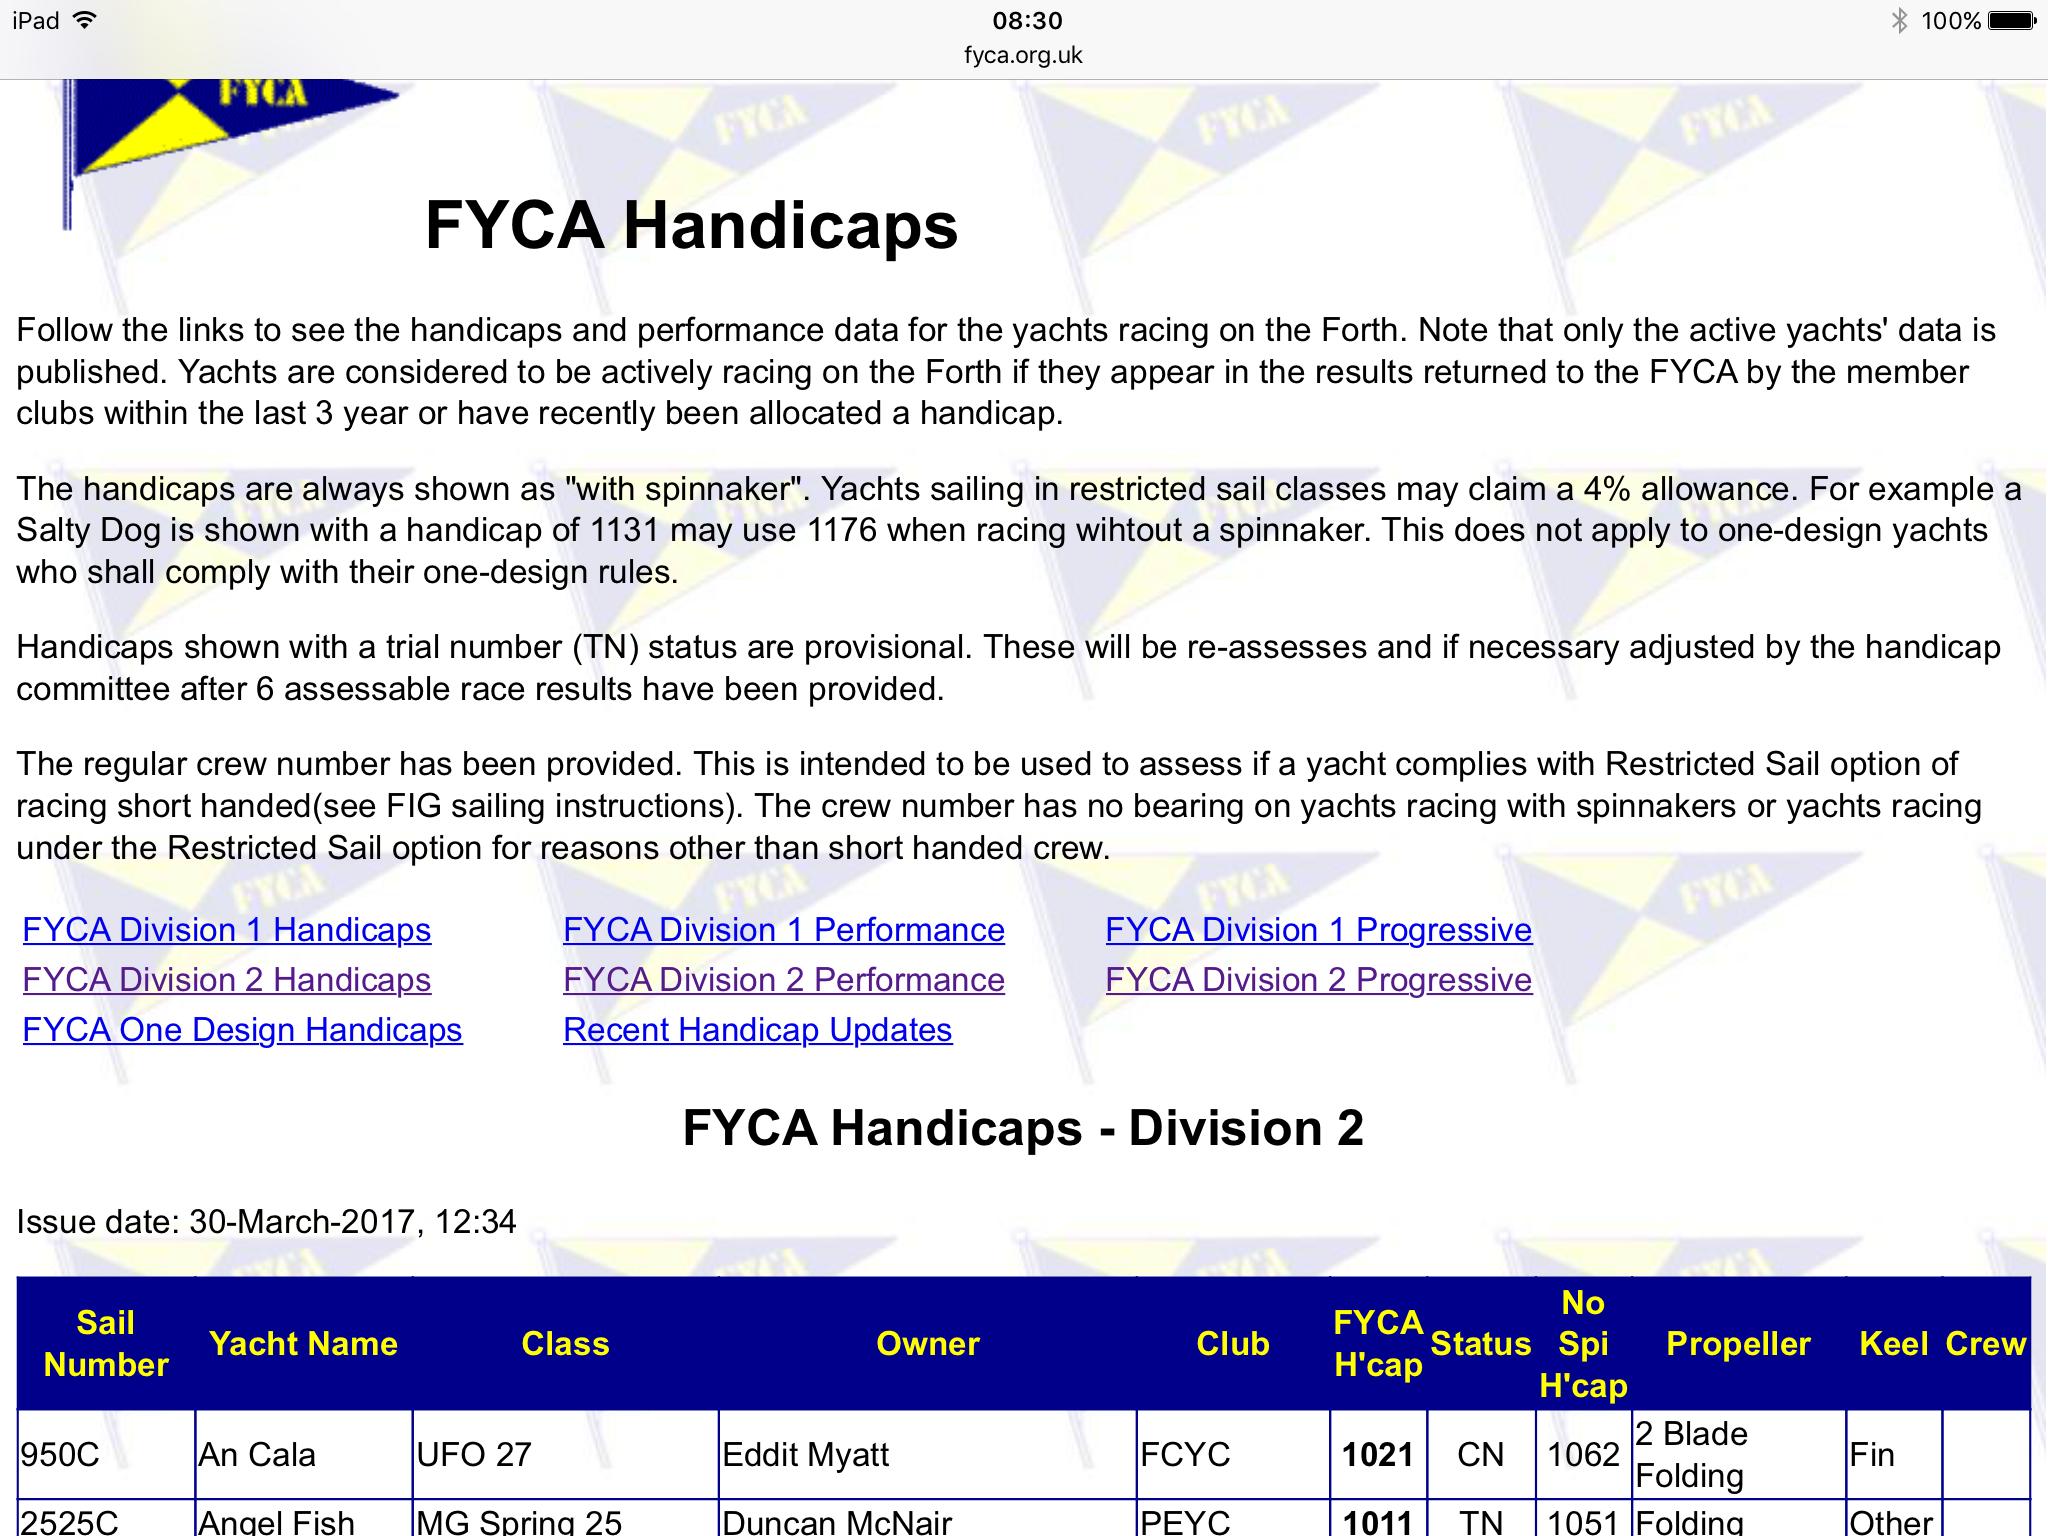 New FYCA progressive handicaps published